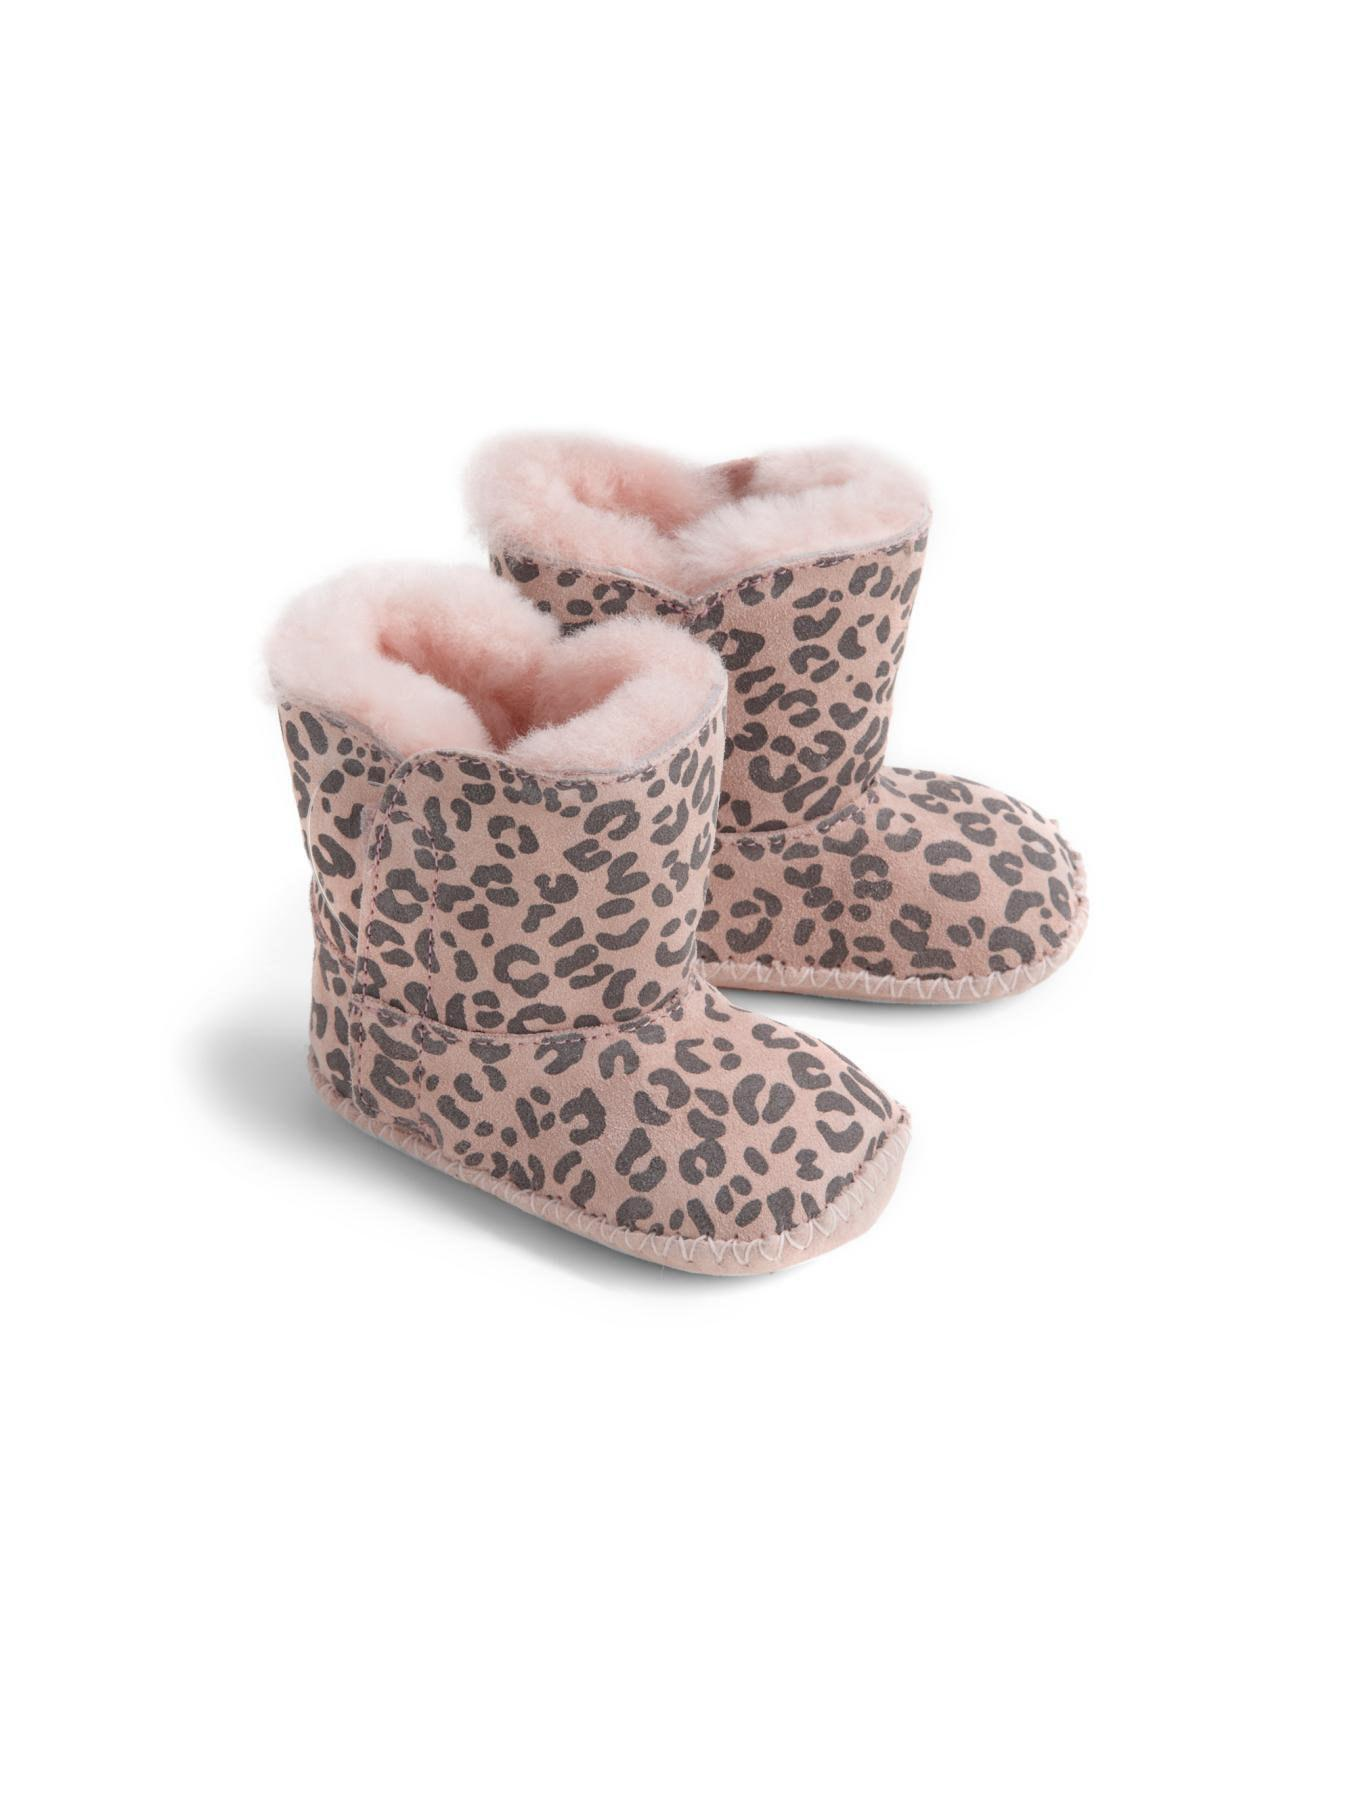 544b16b4847 Women's Pink Baby's Cassie Leopard Boots